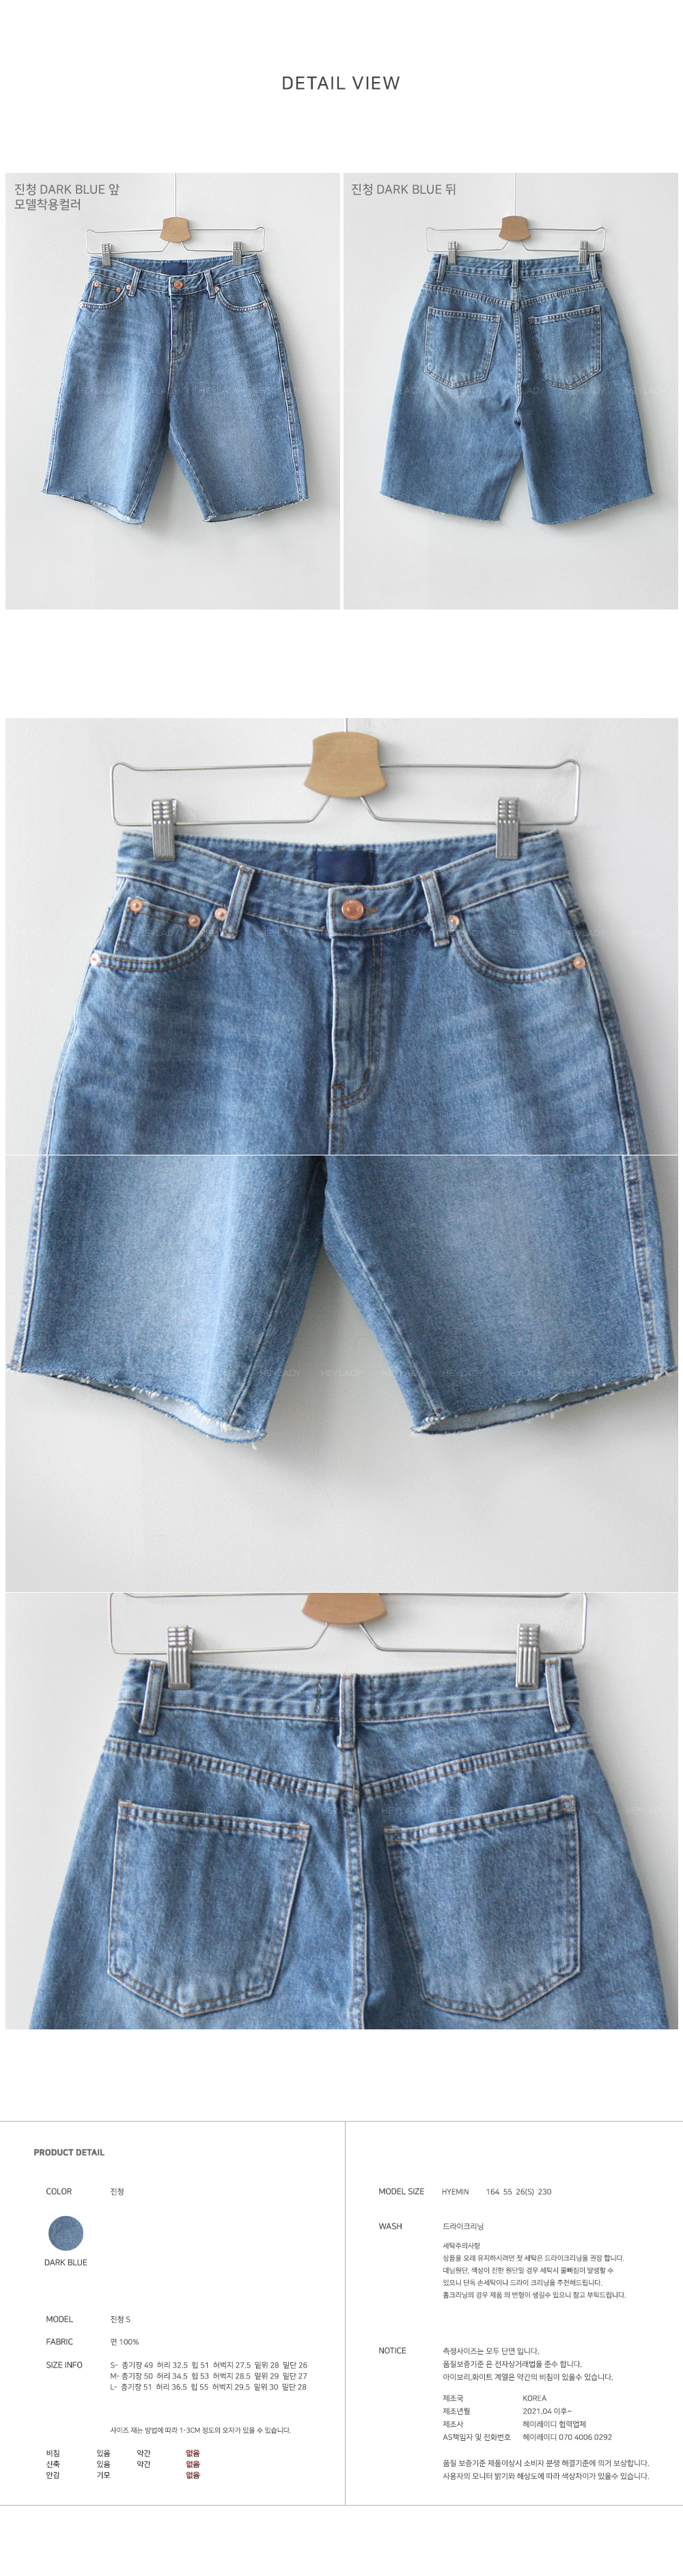 All-tie denim half pants